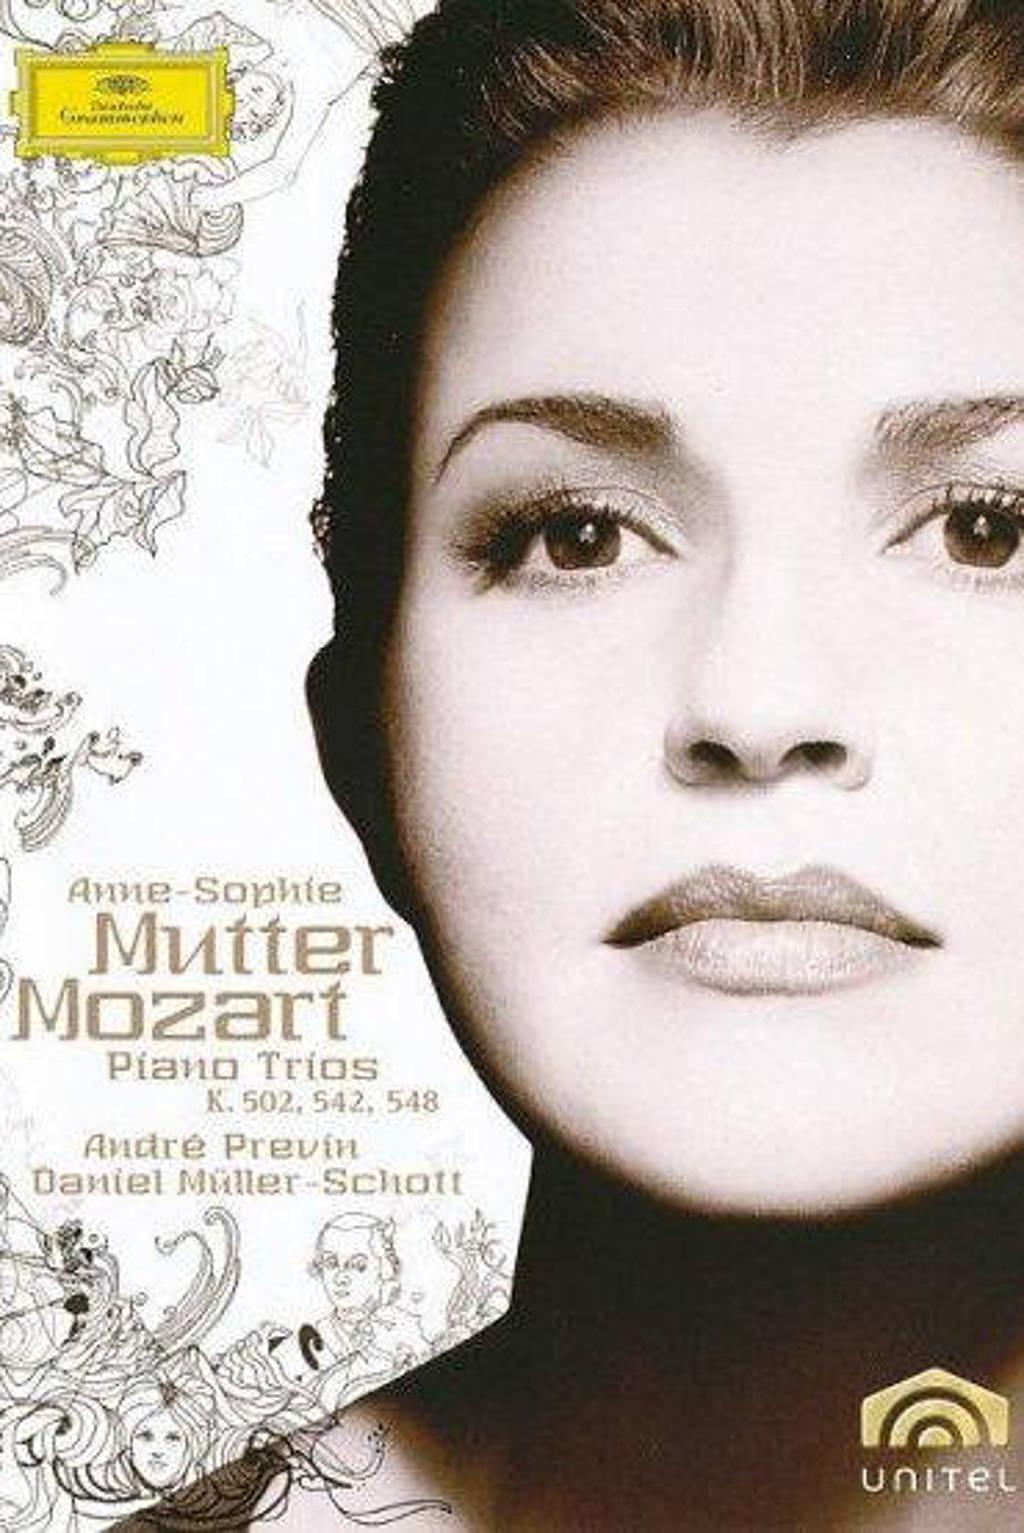 Anne-Sophie Mutter - Mozart piano trios (DVD)